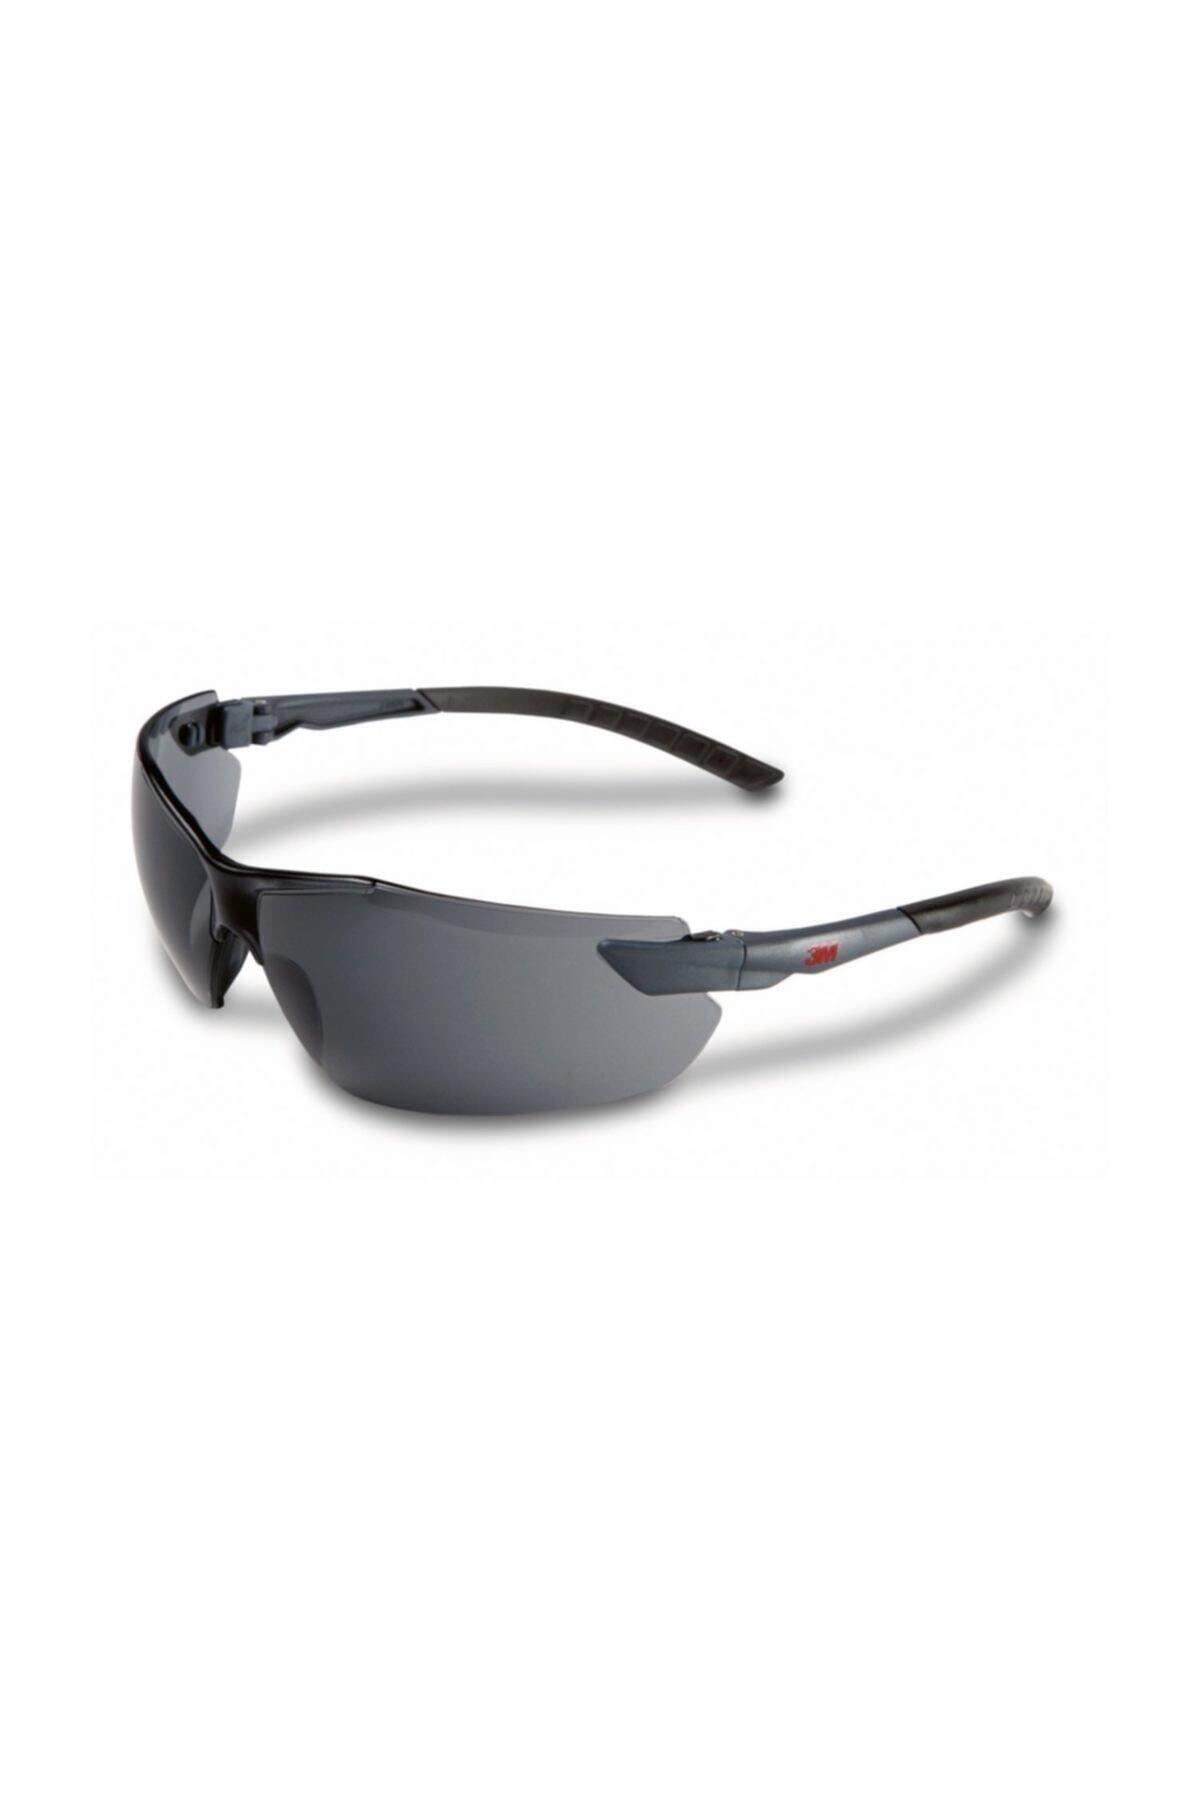 3M 2821 Siyah Iş Güvenlik Gözlüğü 1